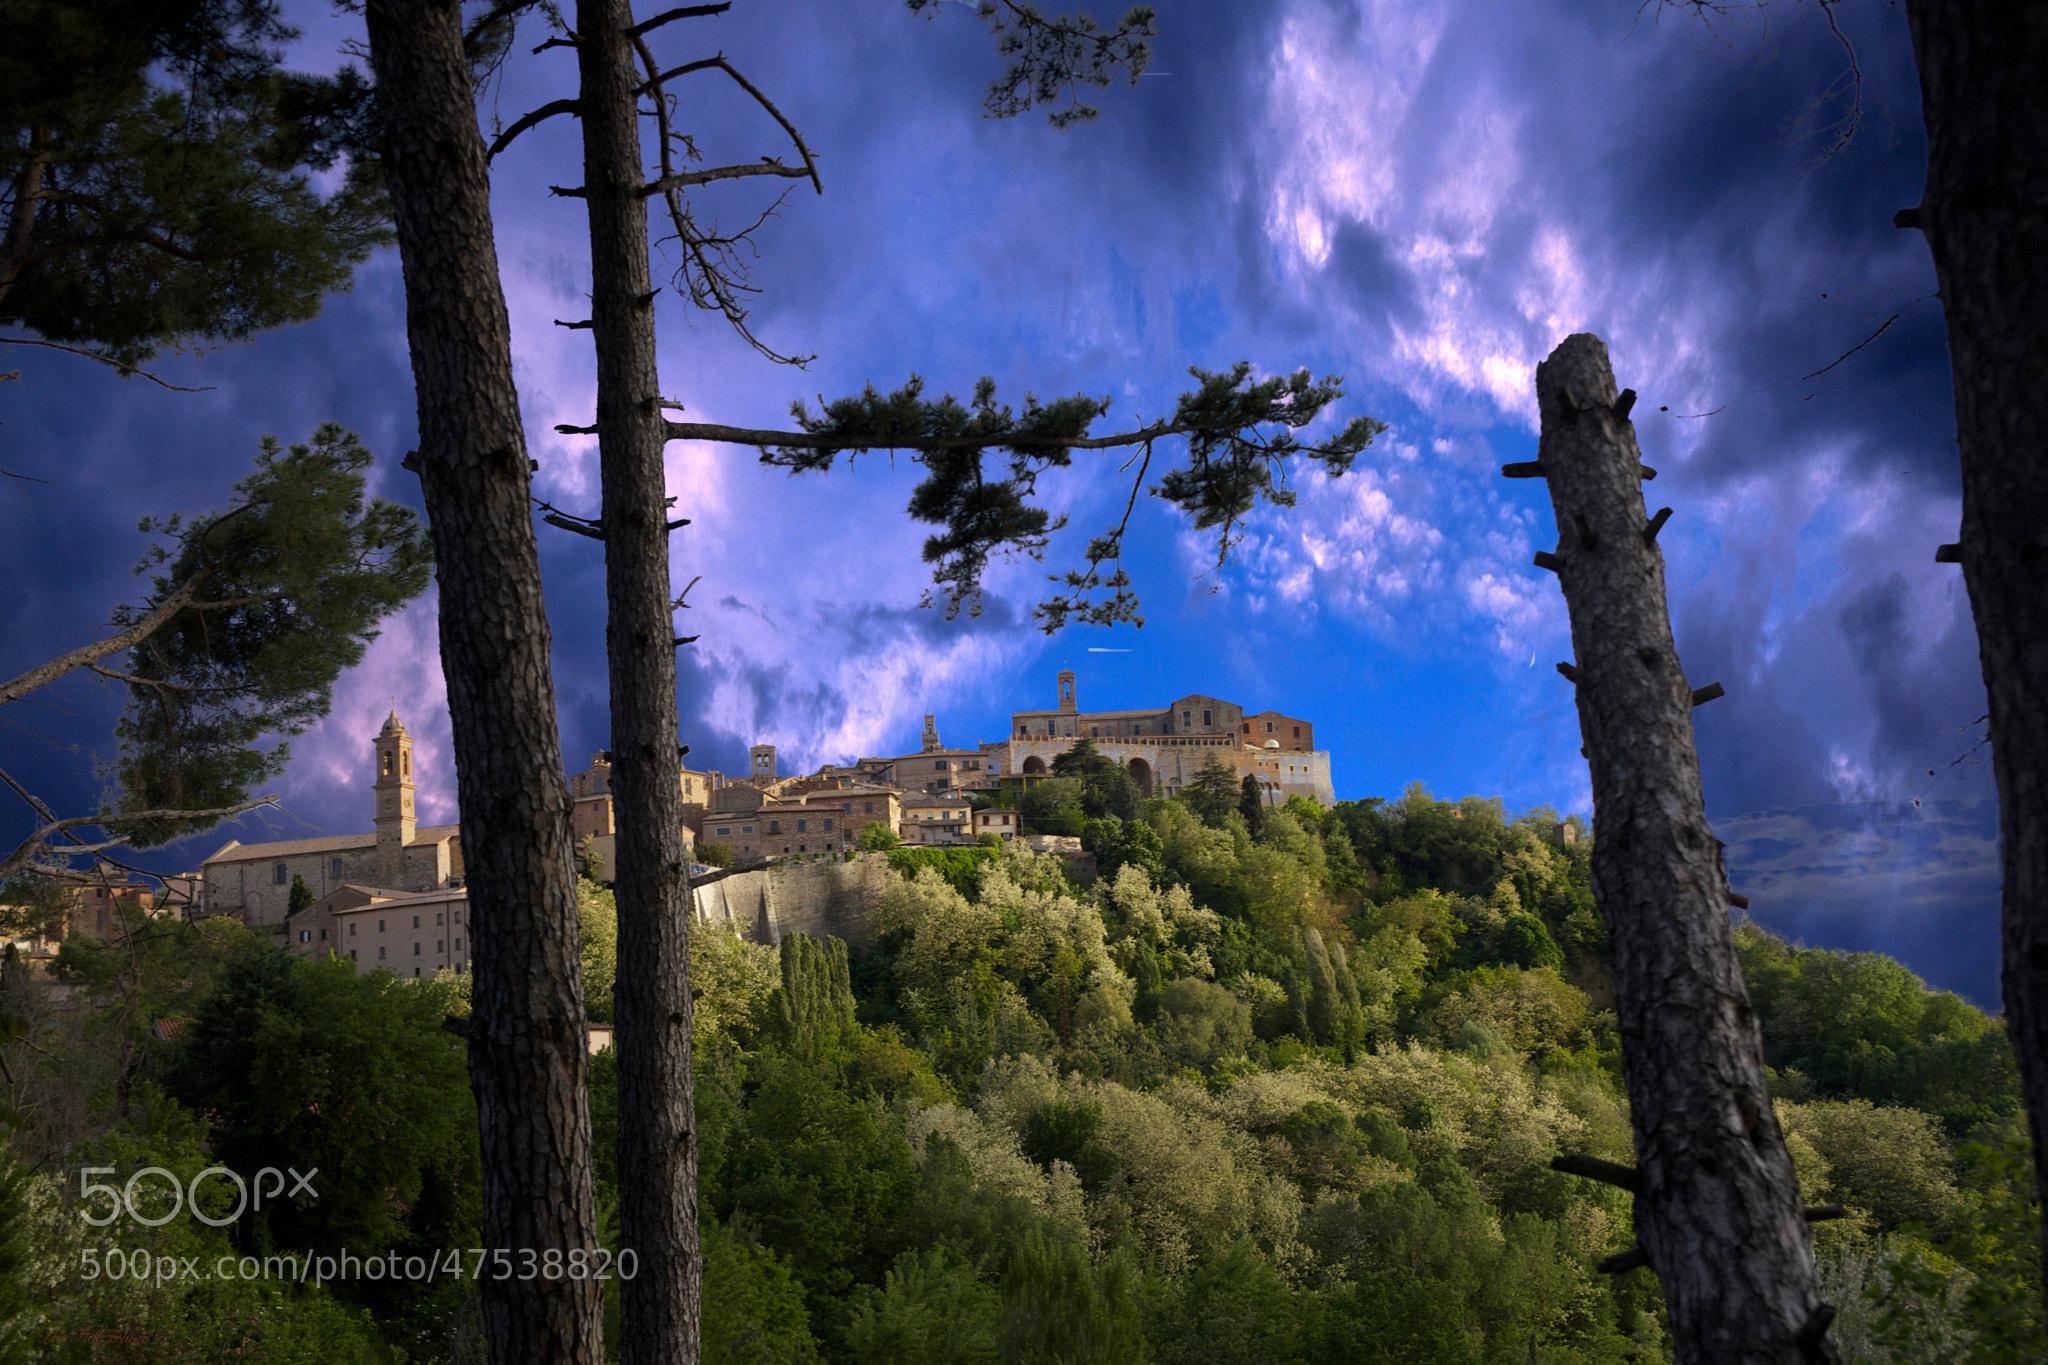 Photograph Montepulciano - Siena - Tuscany by Lorenzo ROSIGNOLI on 500px